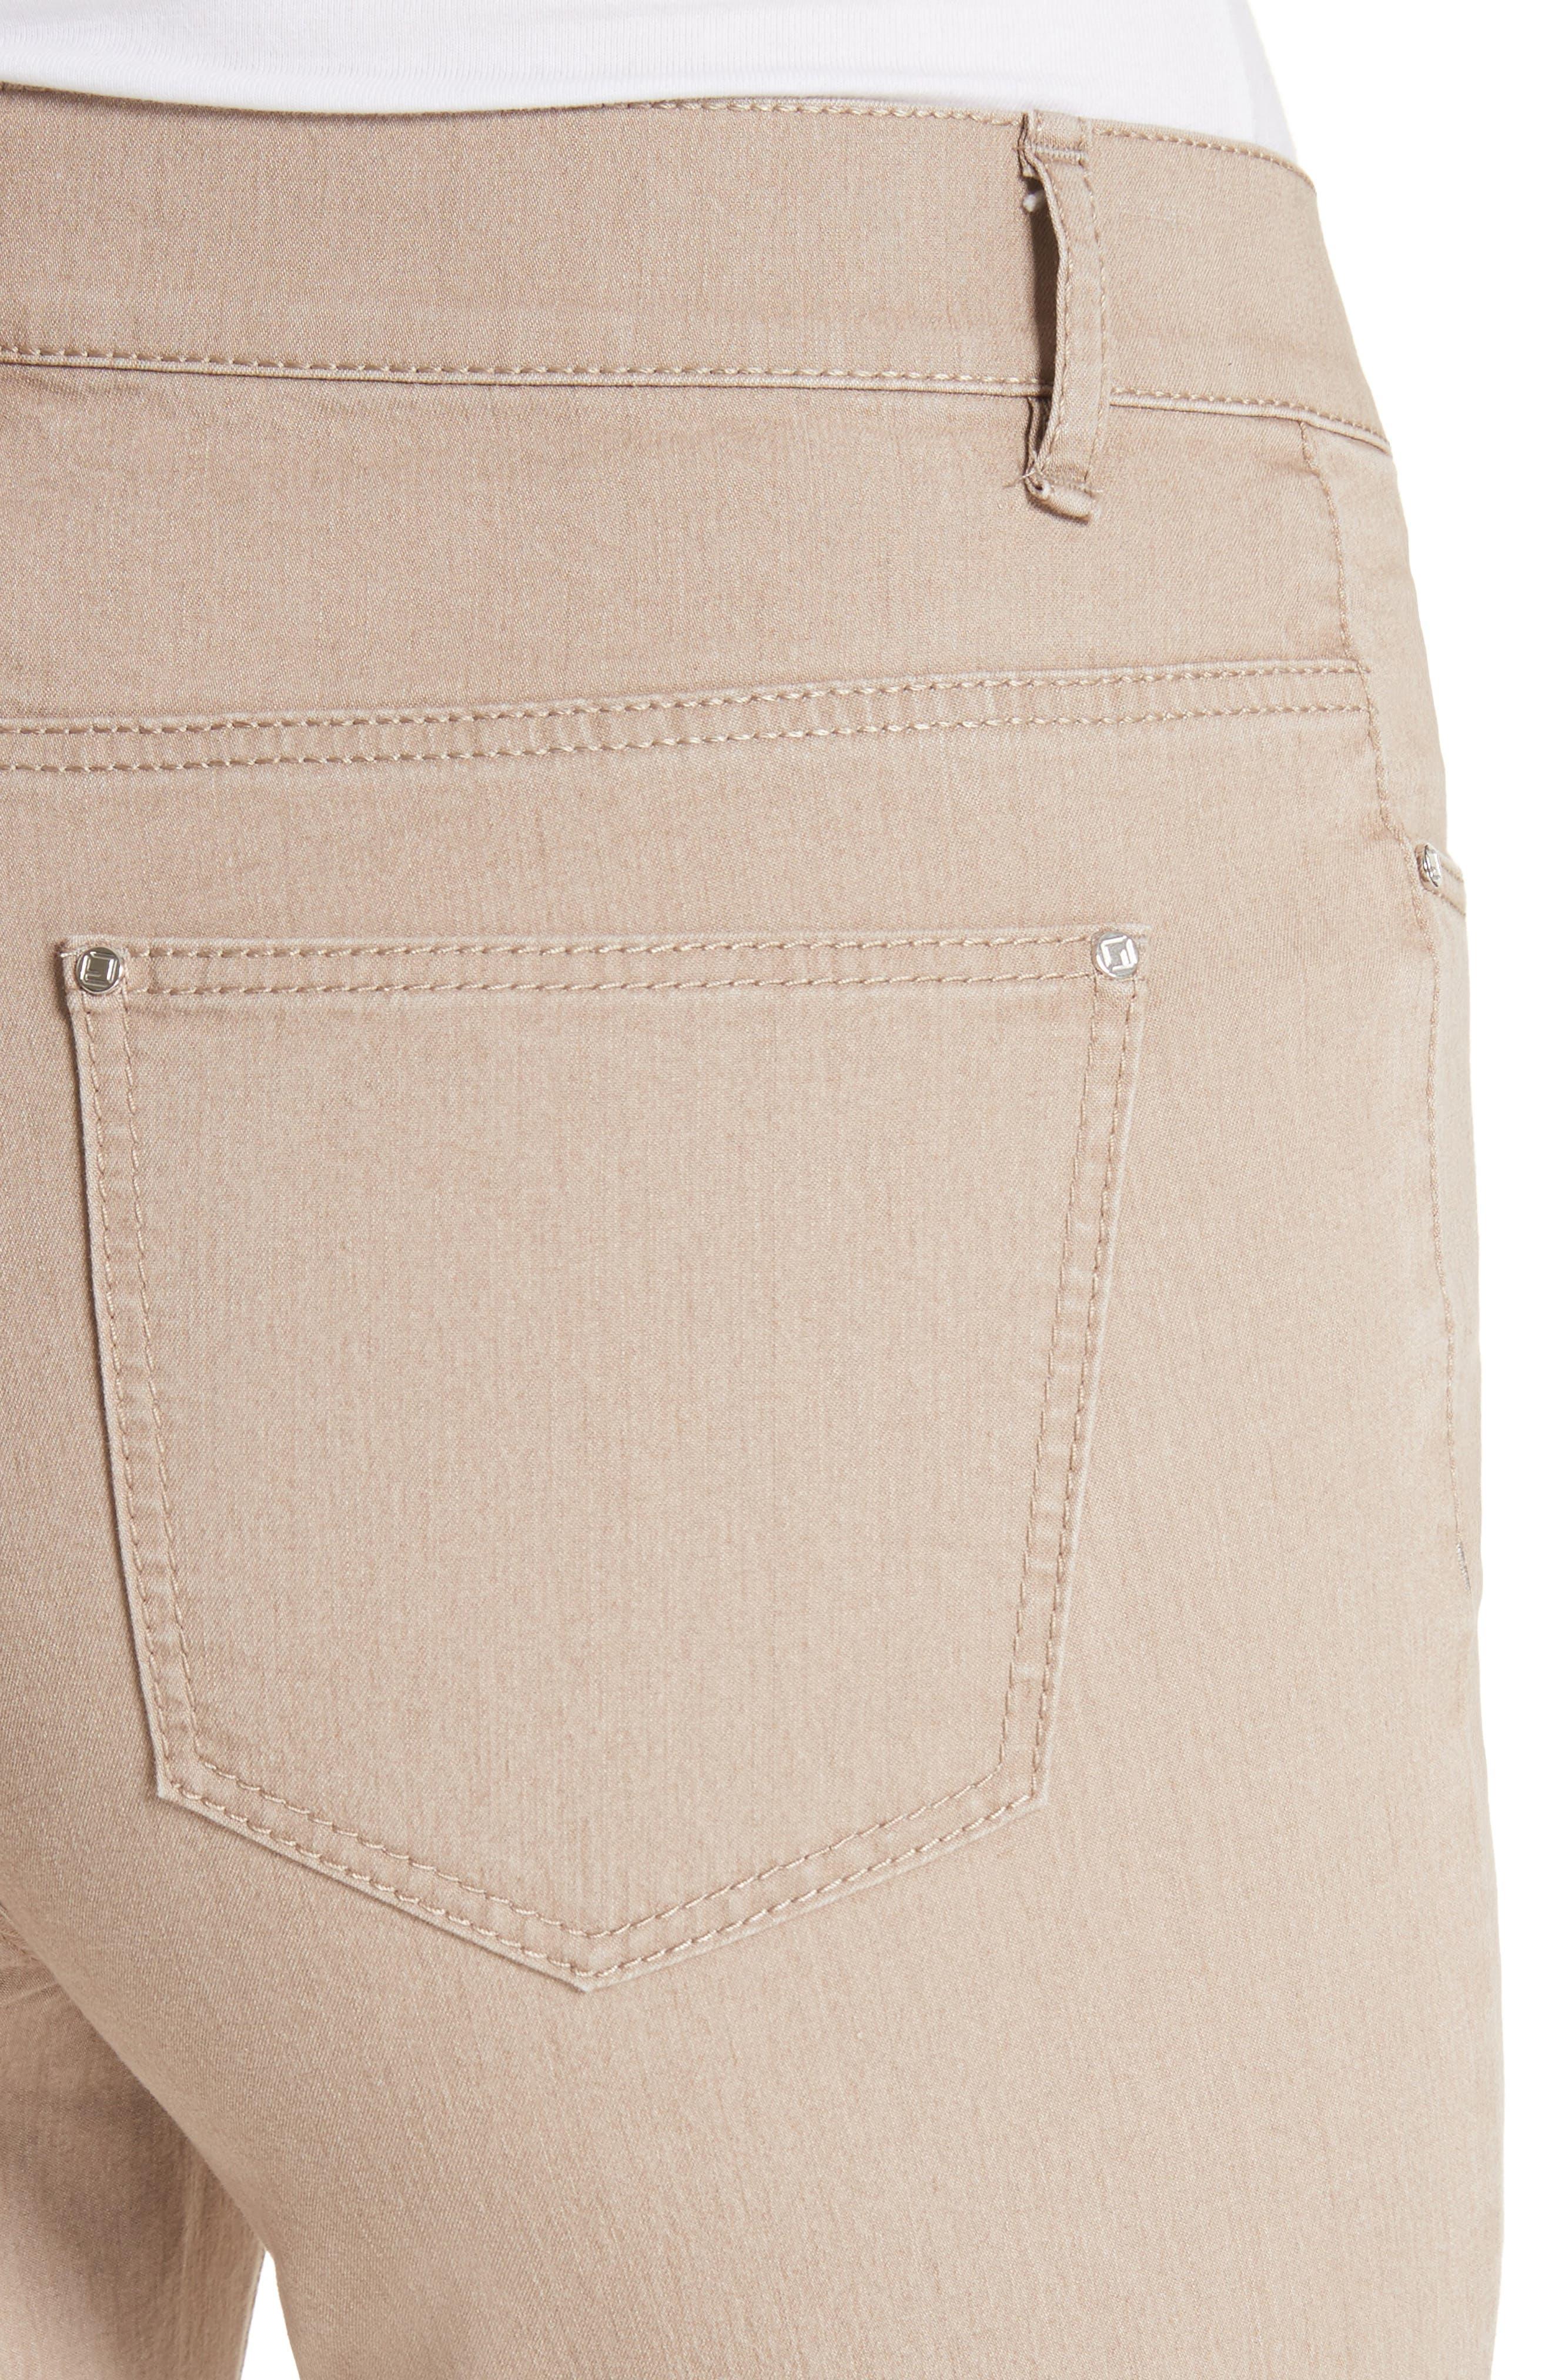 'Primo Denim' Curvy Fit Slim Leg Jeans,                             Alternate thumbnail 27, color,